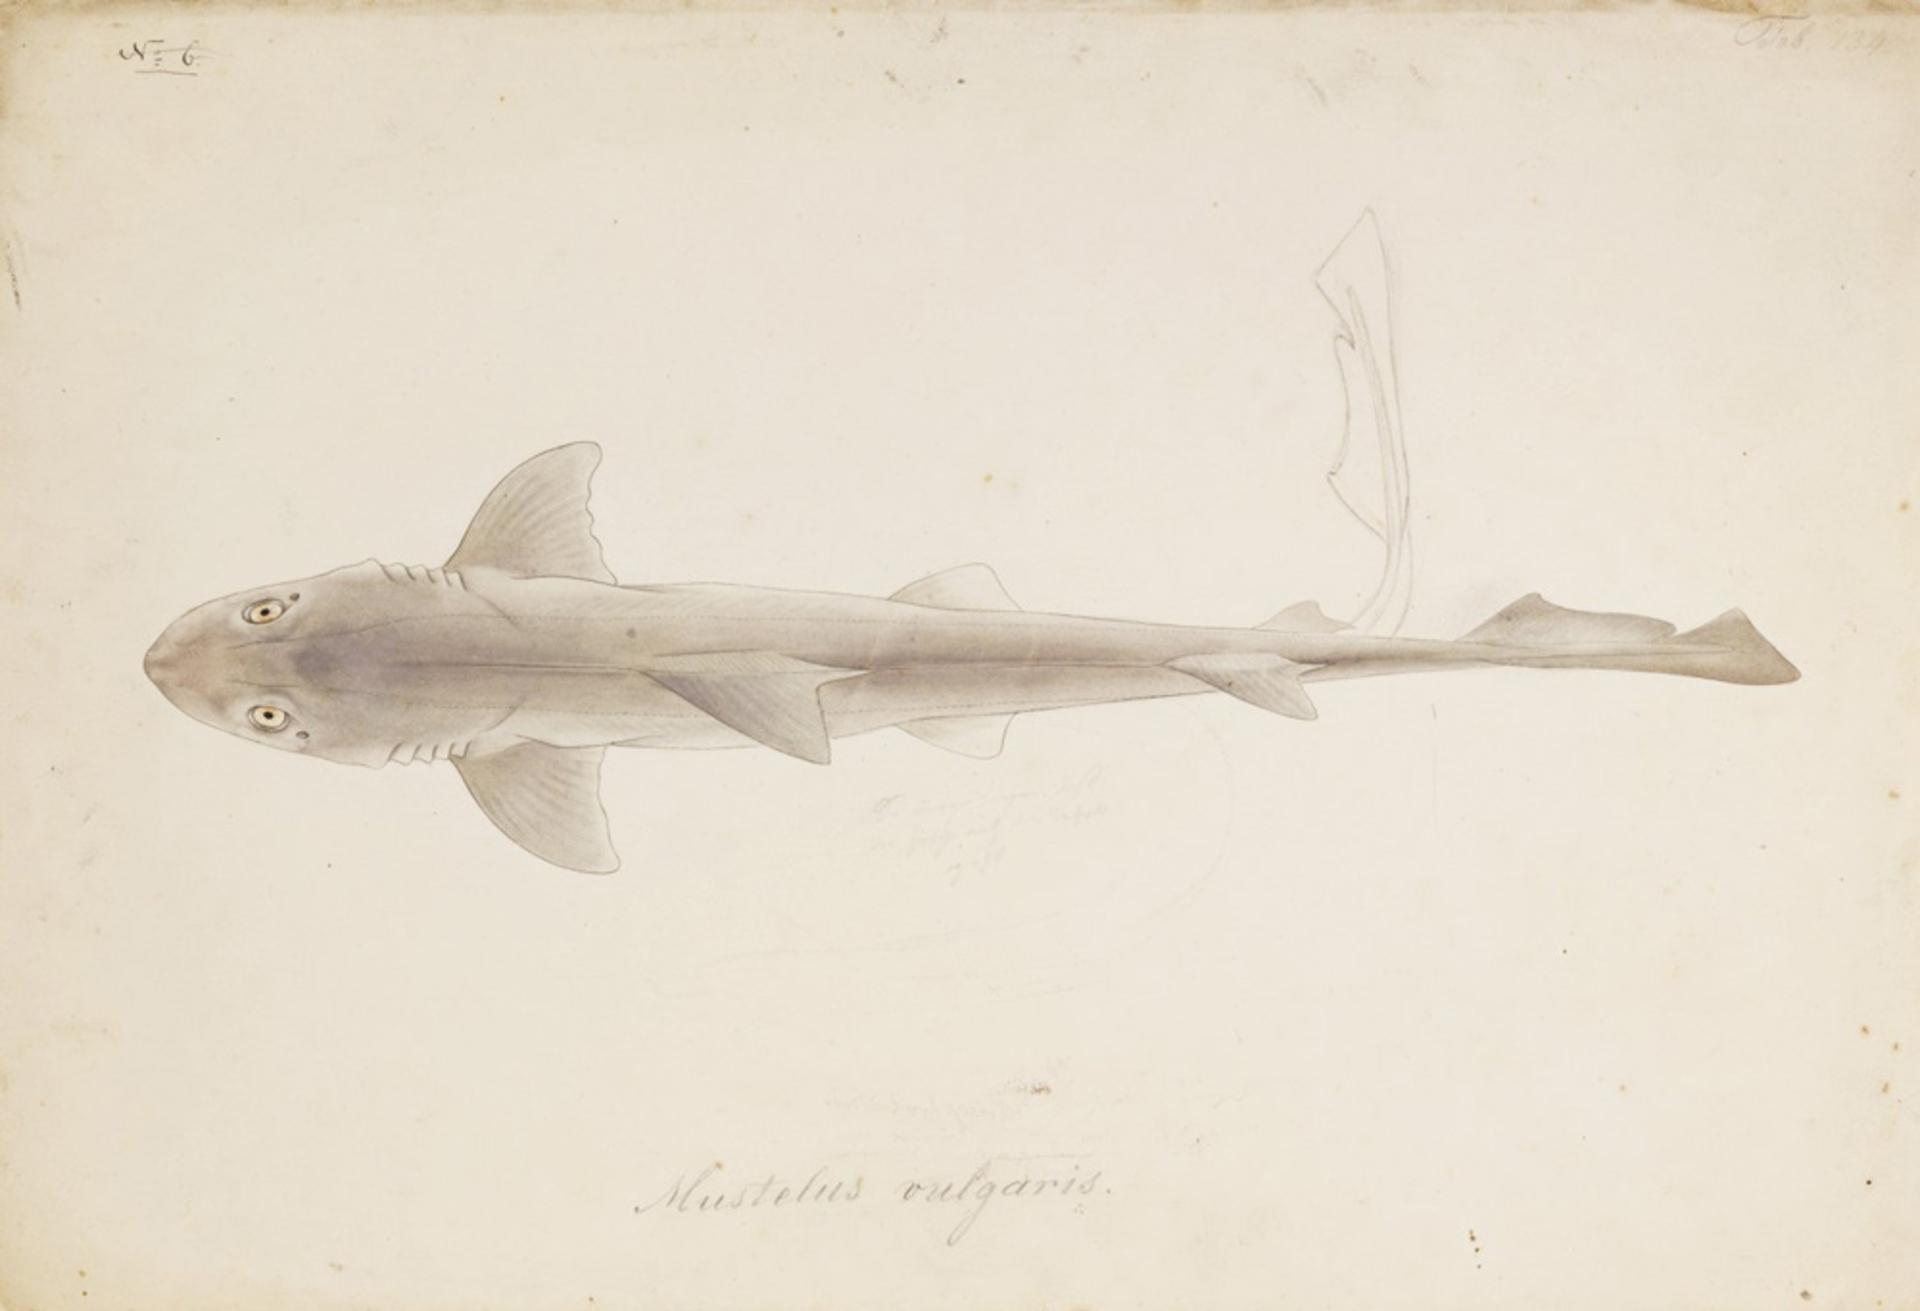 RMNH.ART.262   Carcharhinus gangeticus